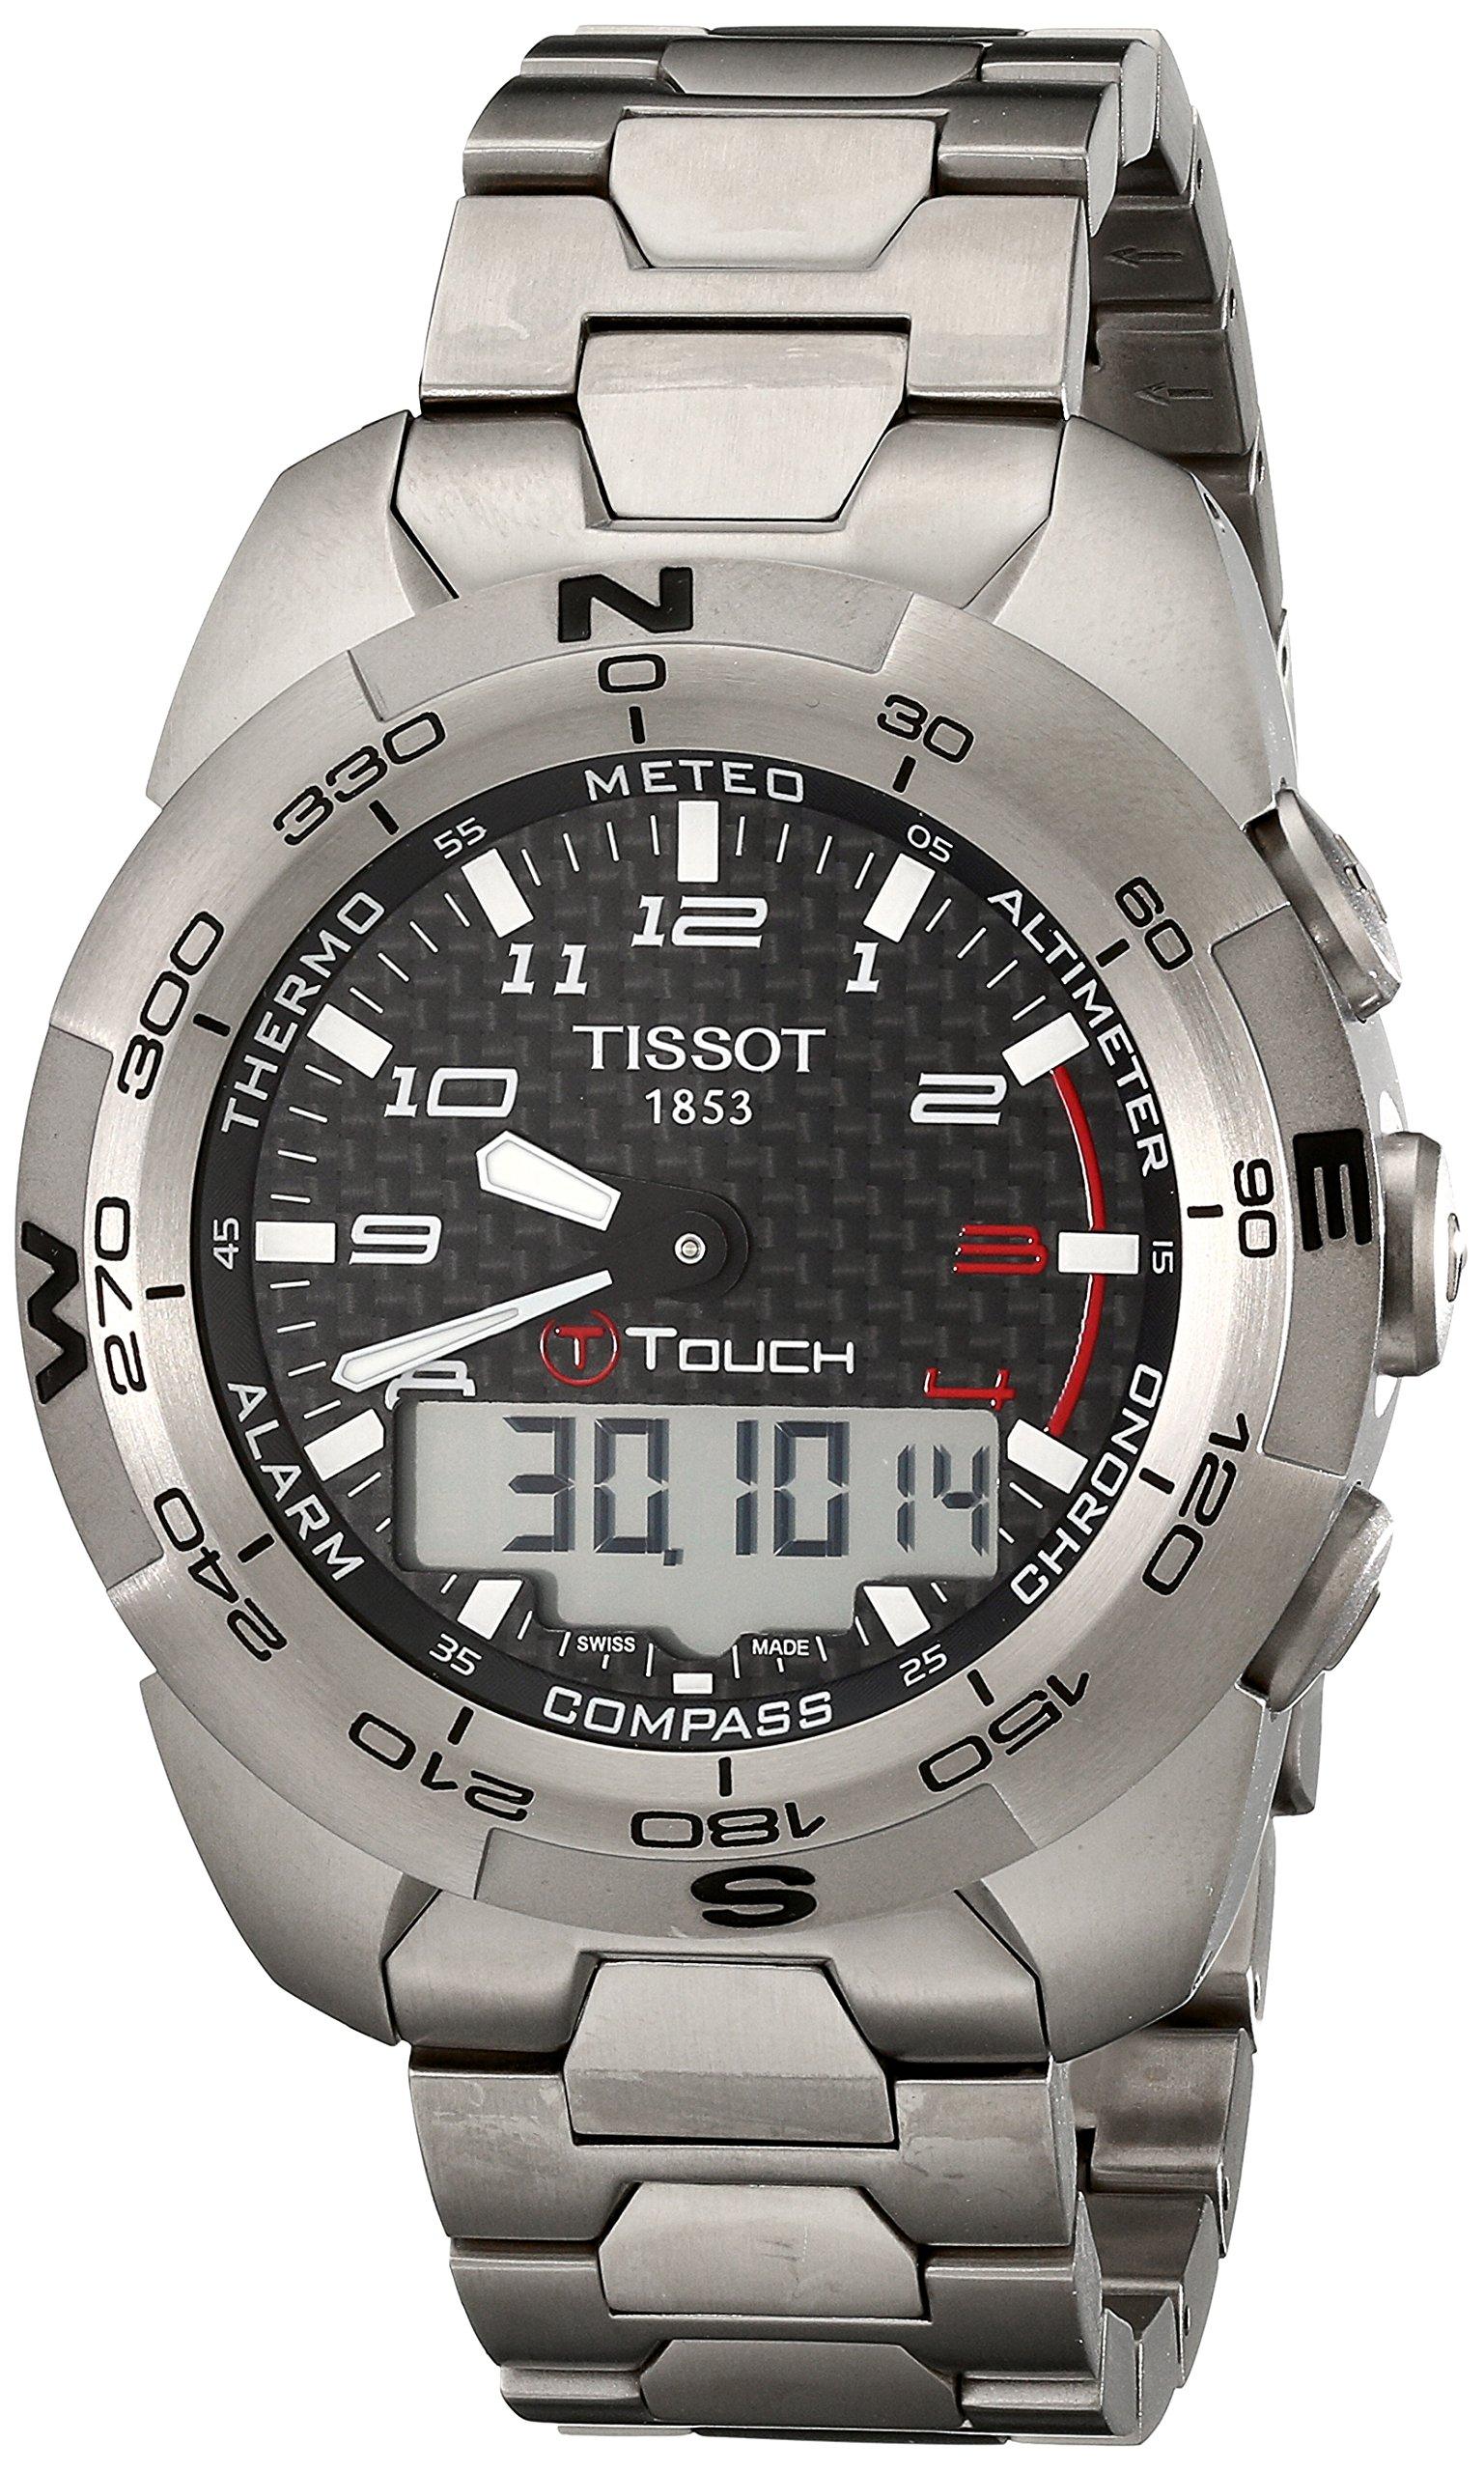 Tissot Reloj de Pulsera T0134204420200